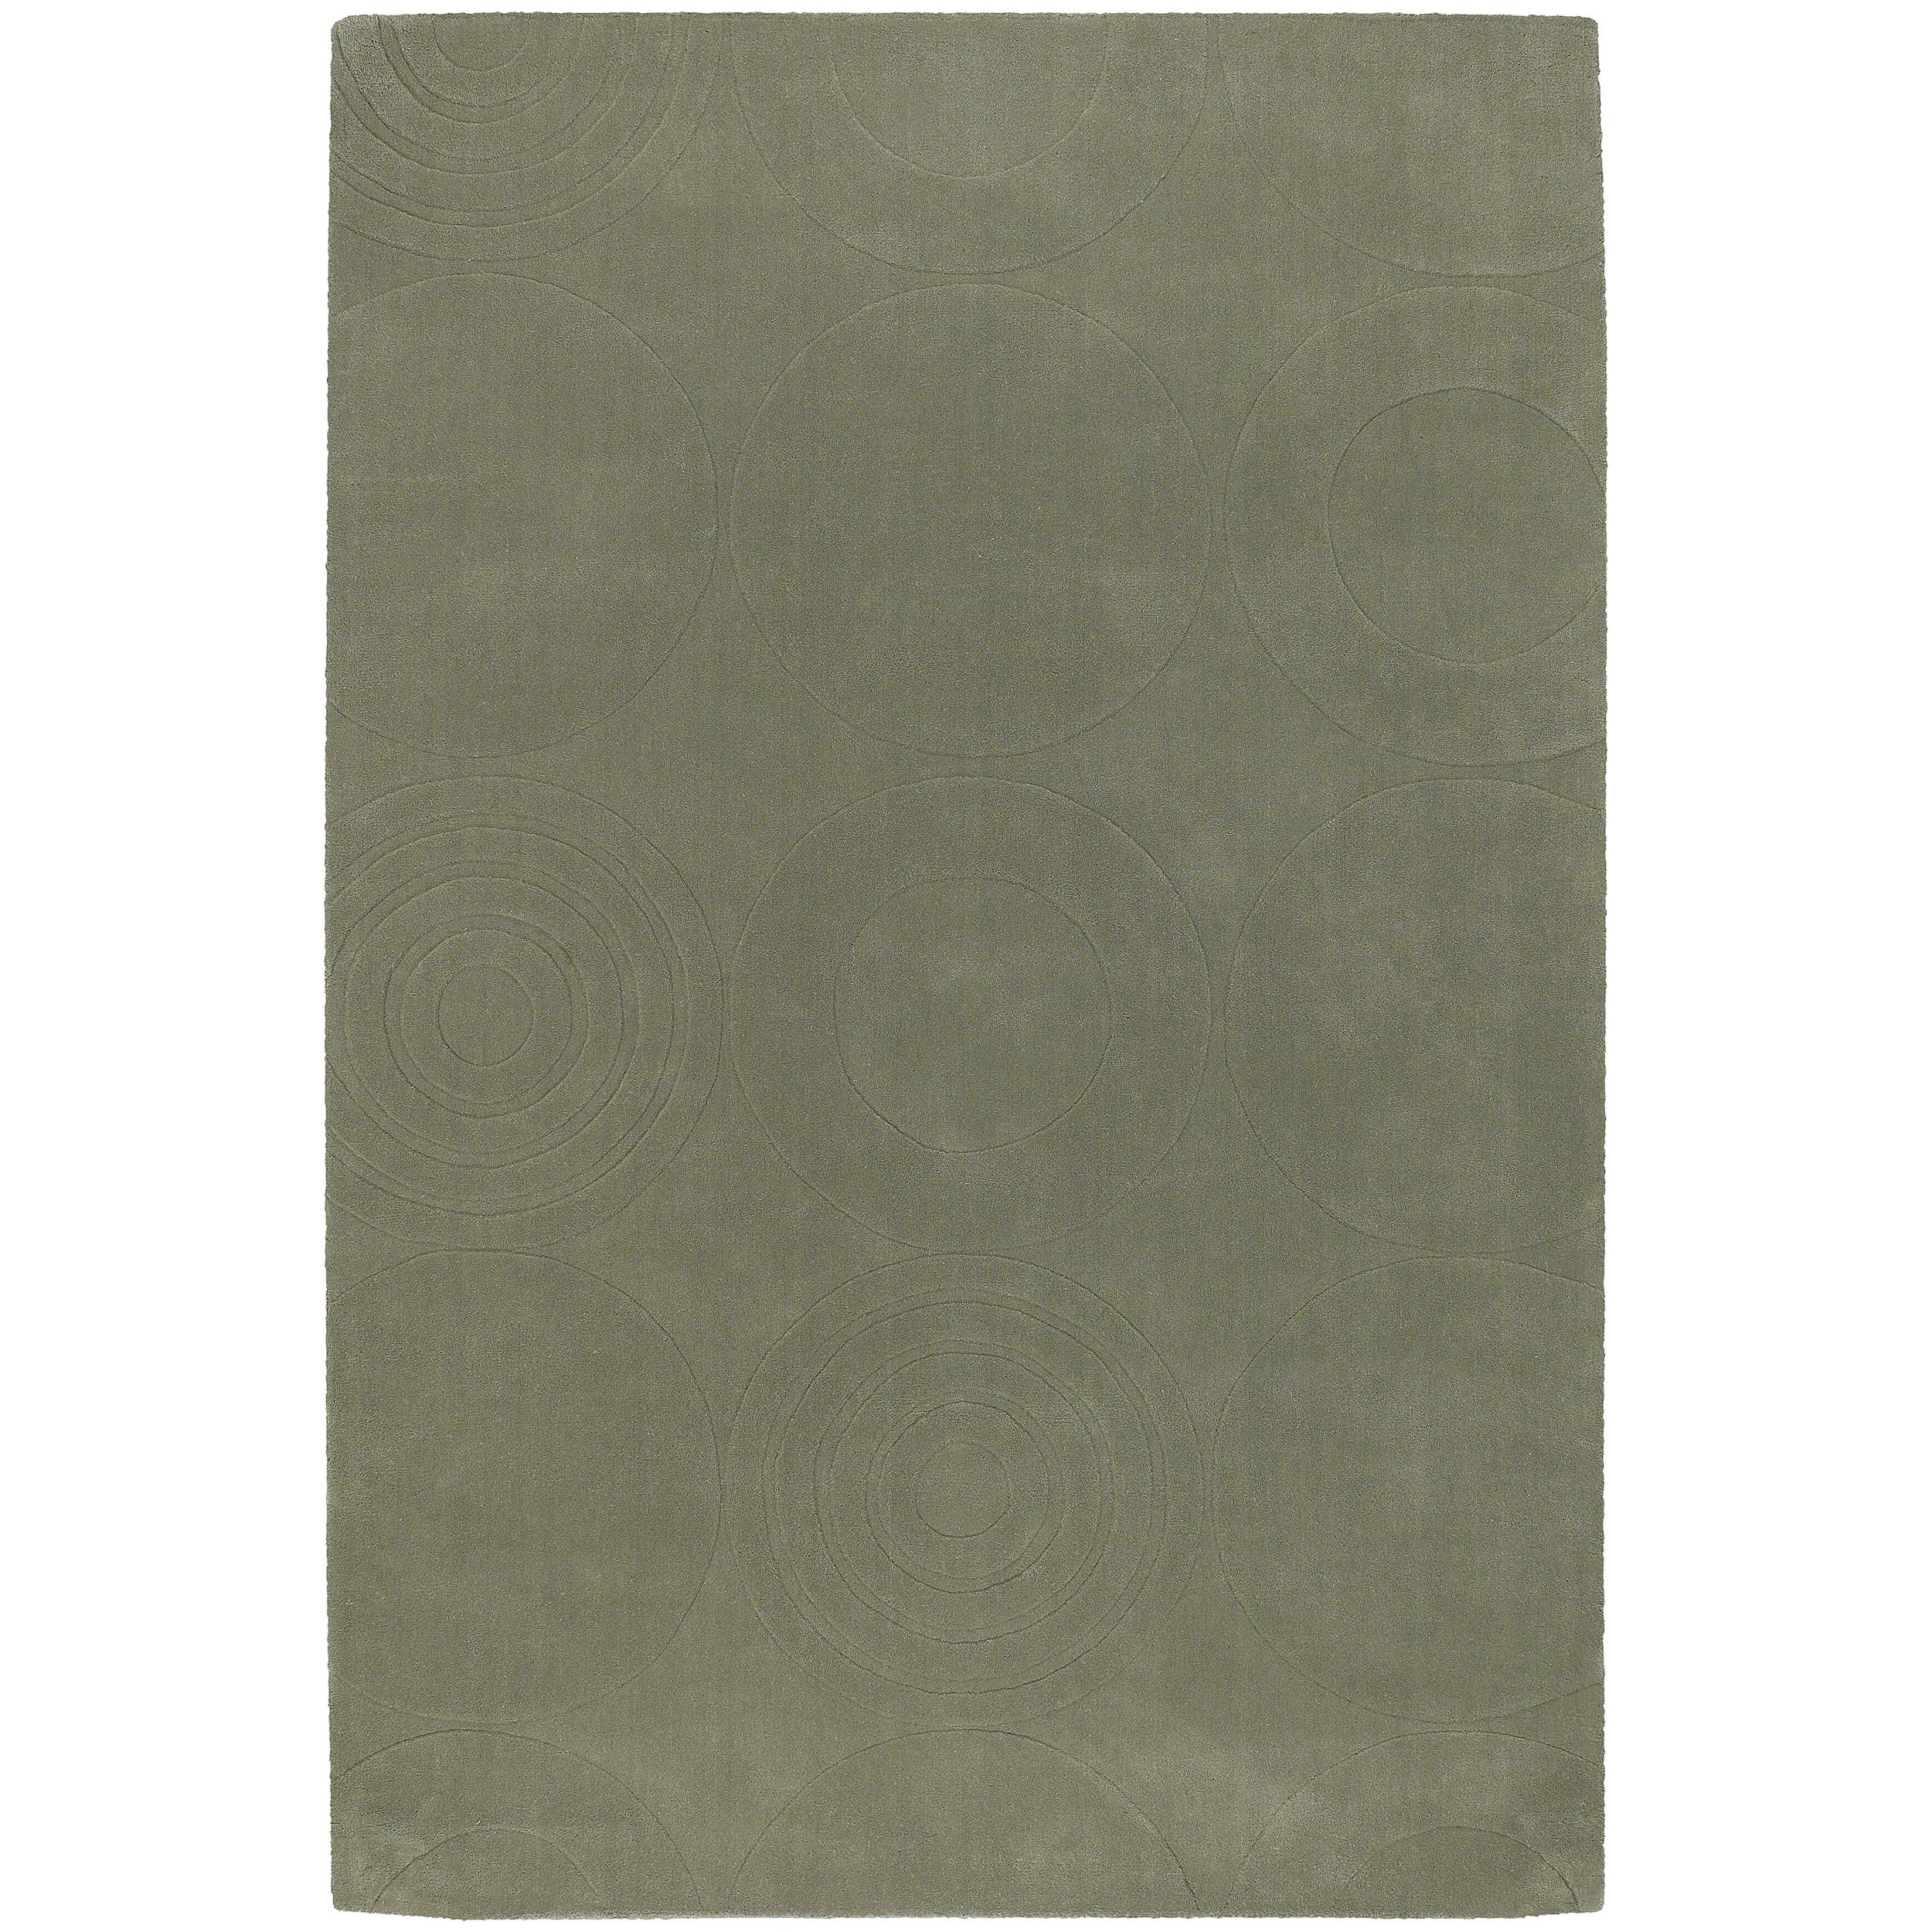 Hand-crafted Green Geometric Choro Wool Rug (5' x 8')